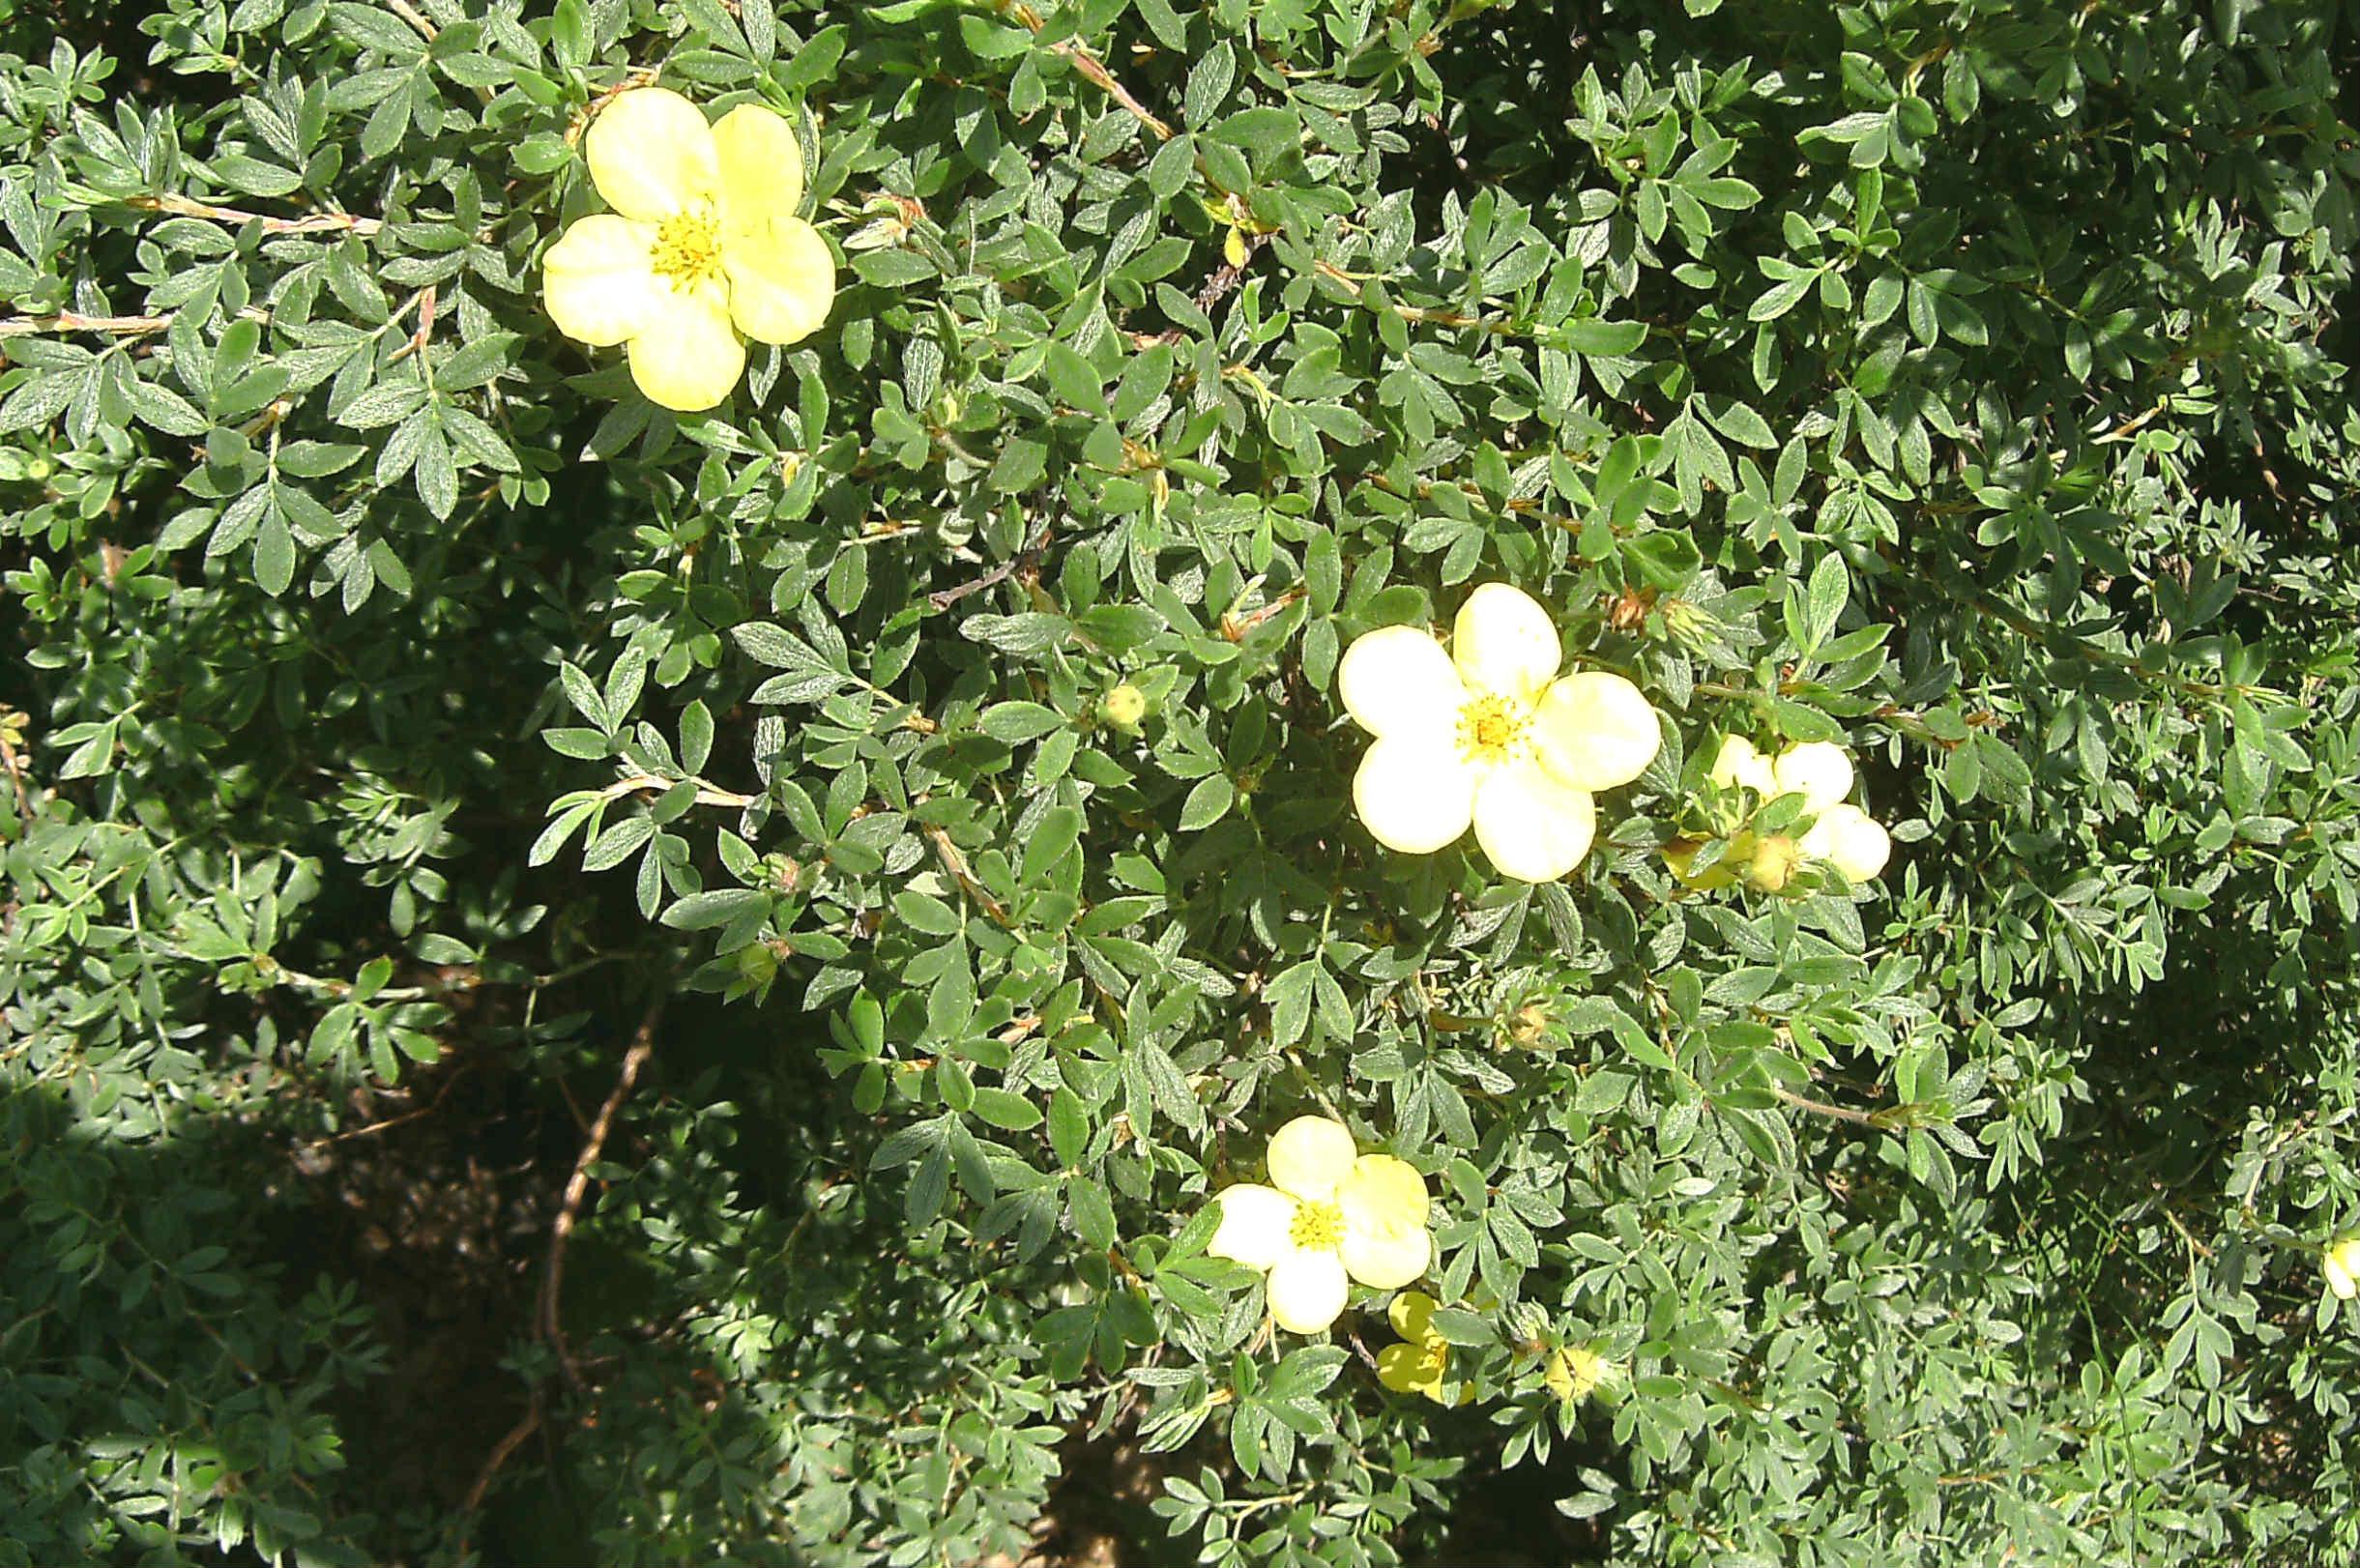 Dasiphora fruticosa (Potentilla f.) 570.5